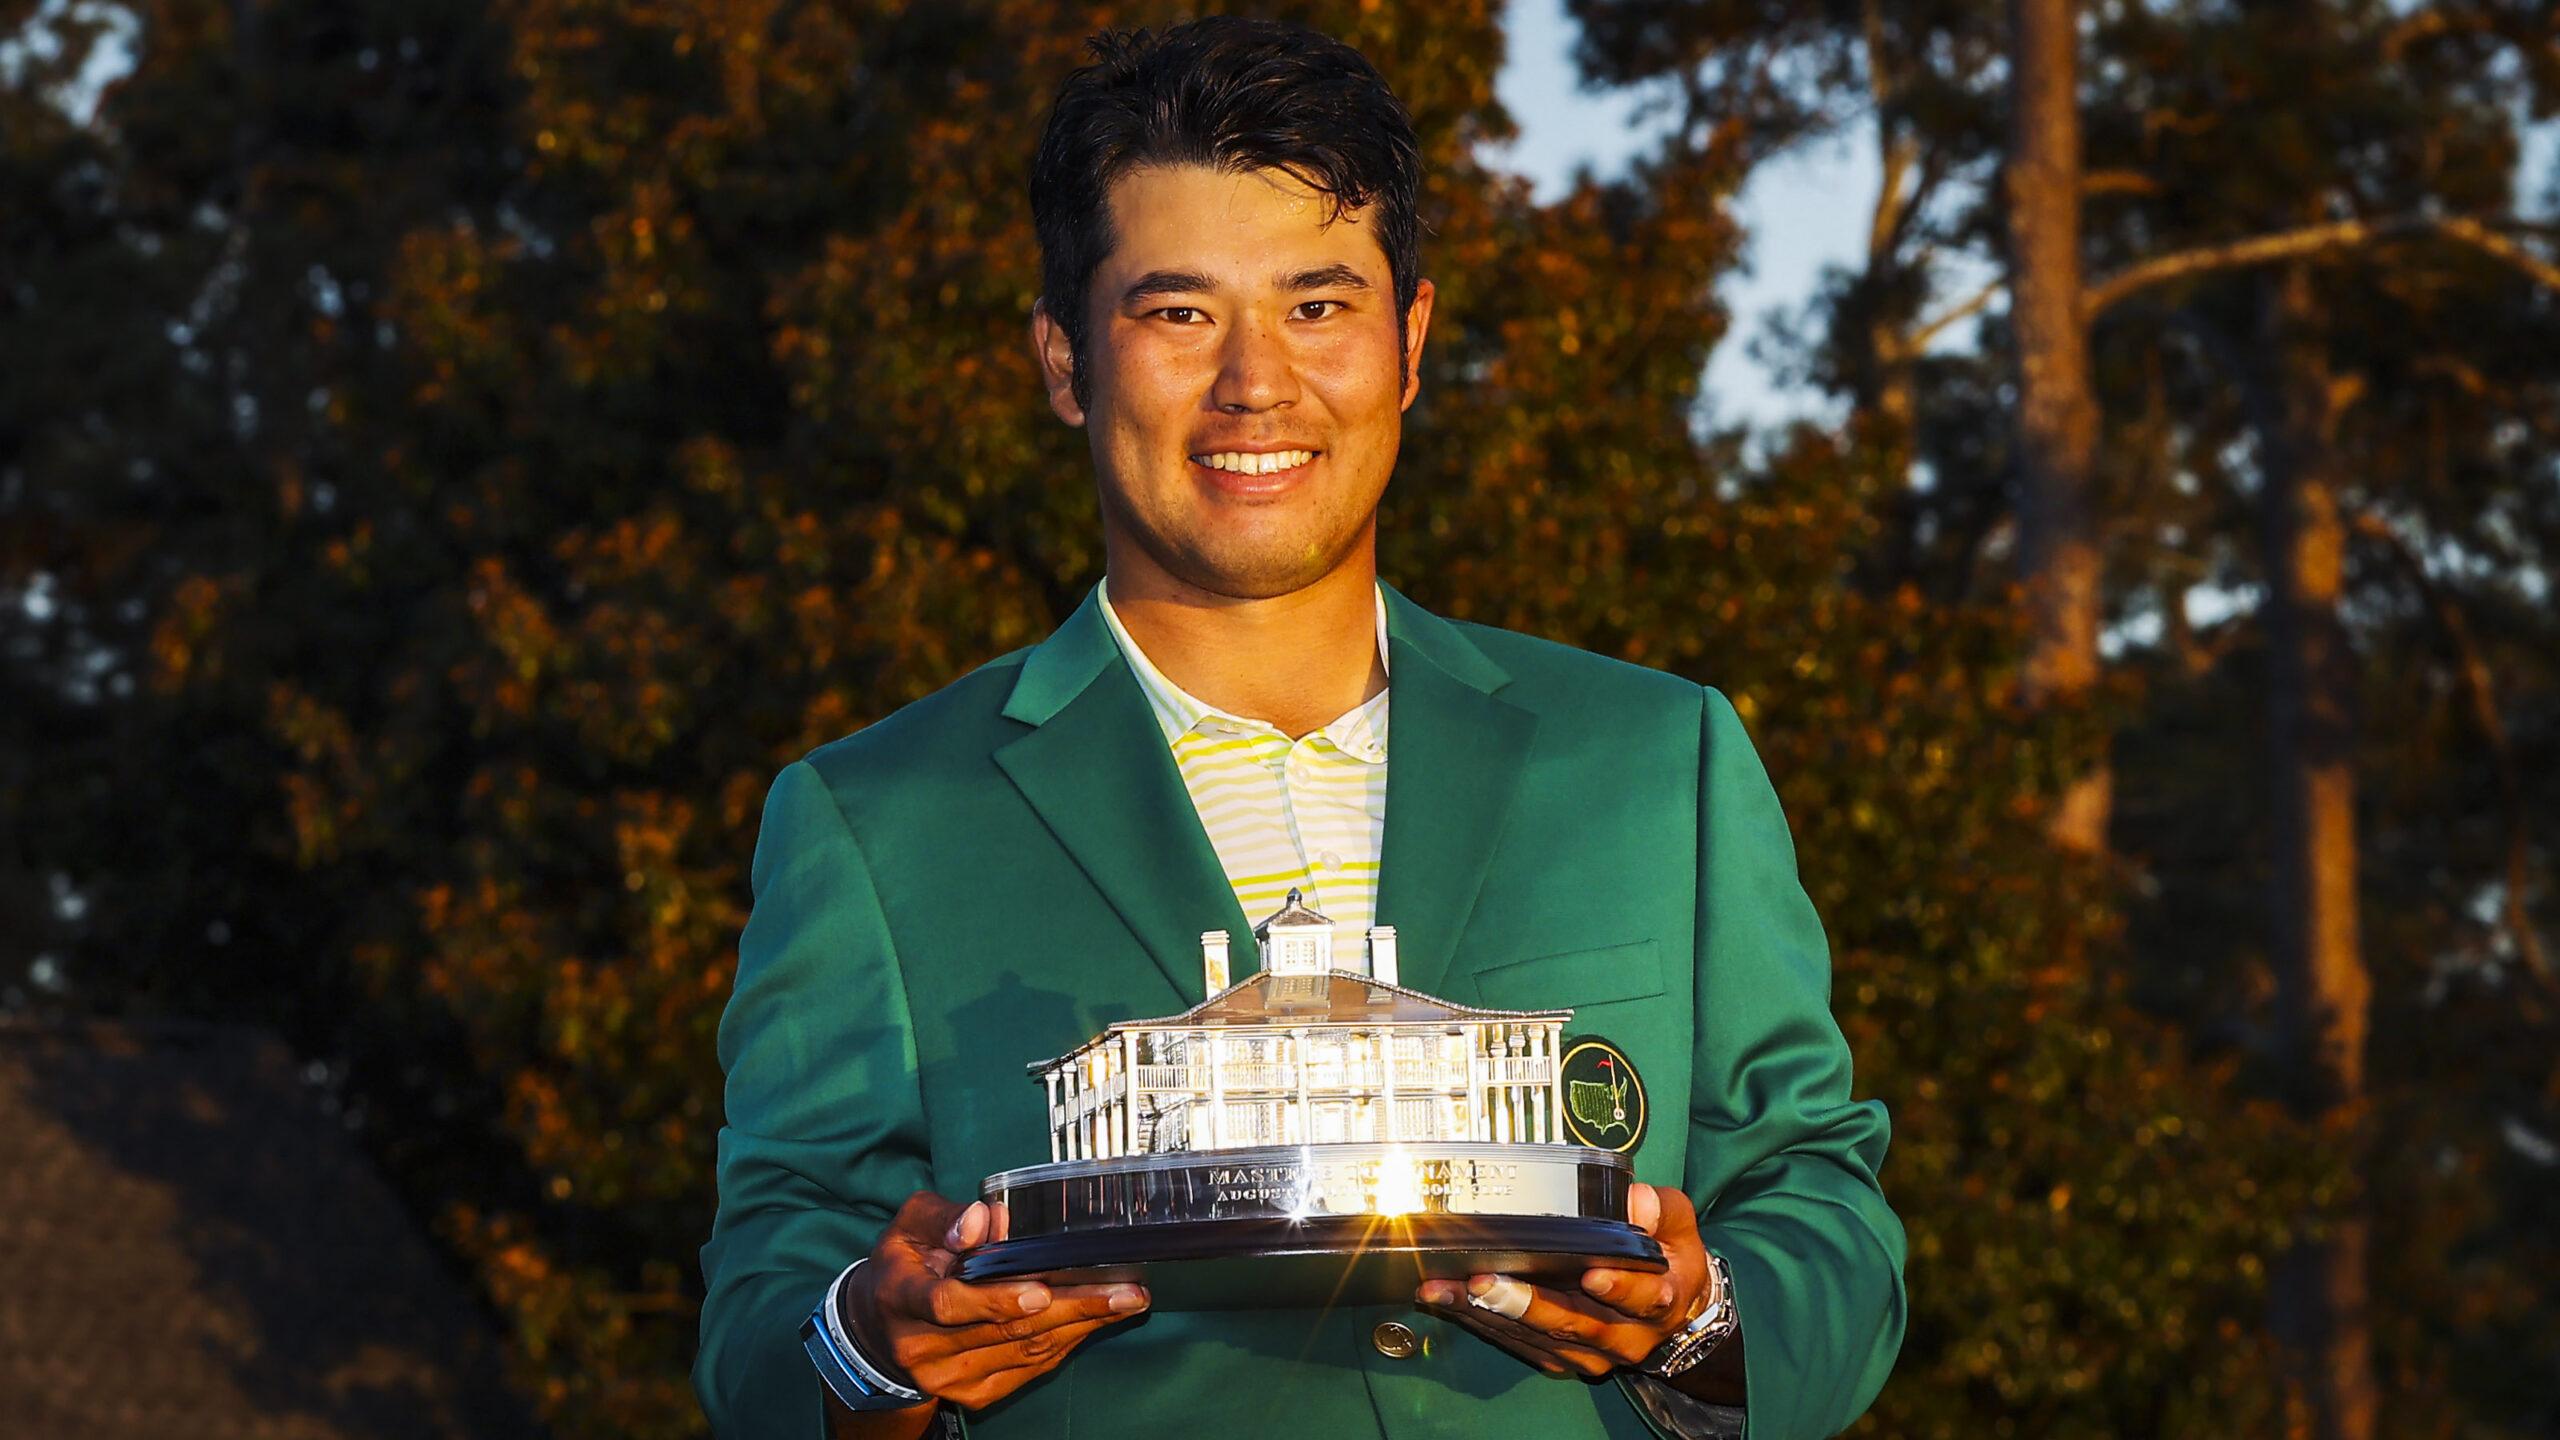 Sejarah golf baru tercipta saat Hideki Matsuyama berhasil menjadi pegolf Jepang pertama yang menjuarai Golf Masters 2021.